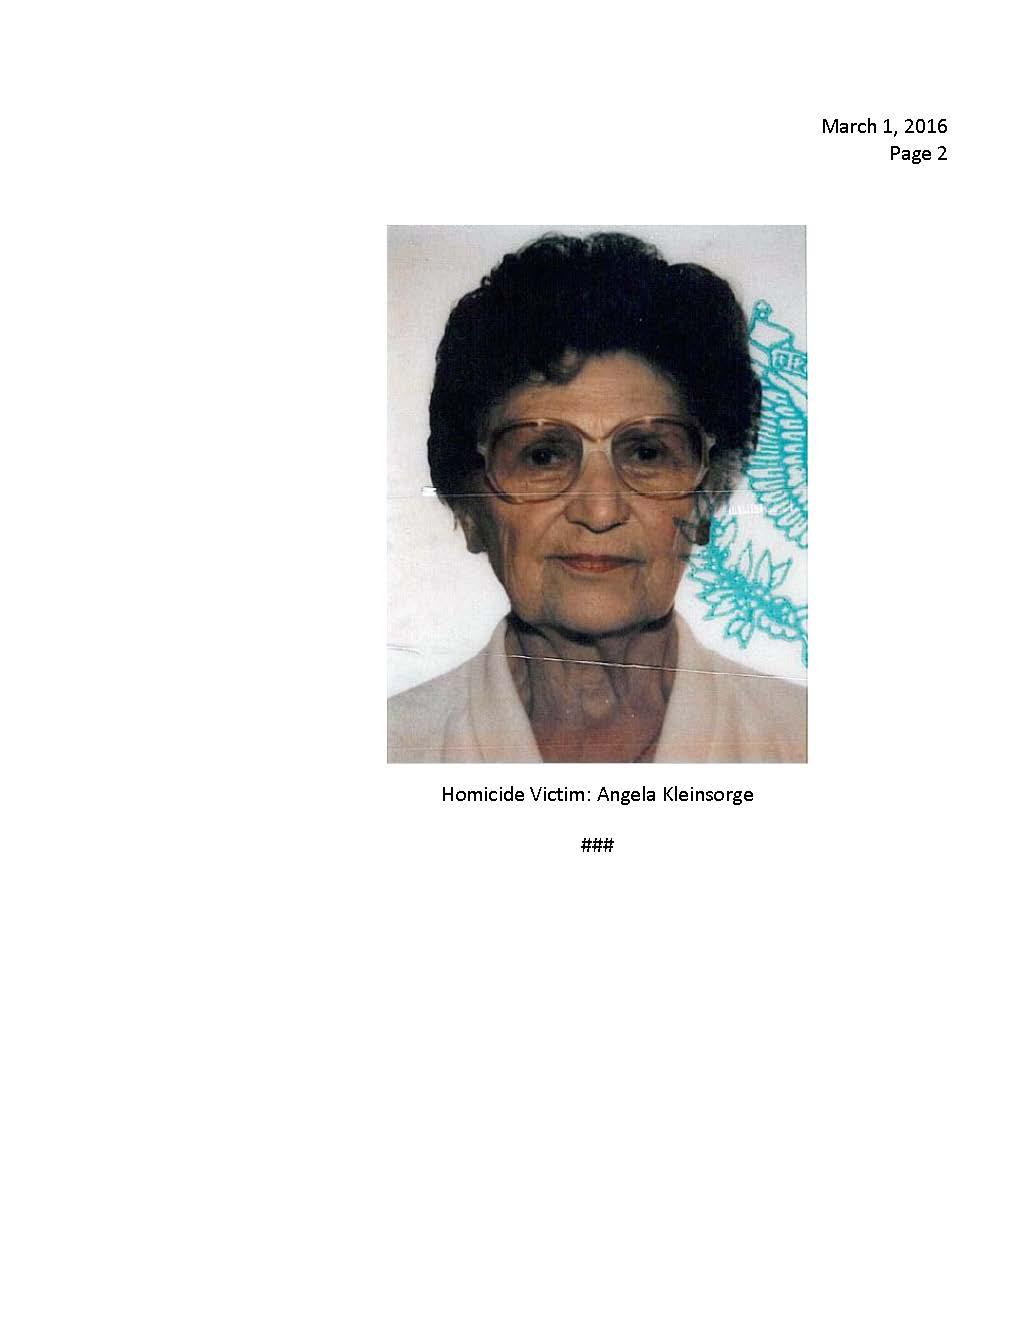 030116 Angela Kleinsorge Homicide - 24 year anniversary_Page_2